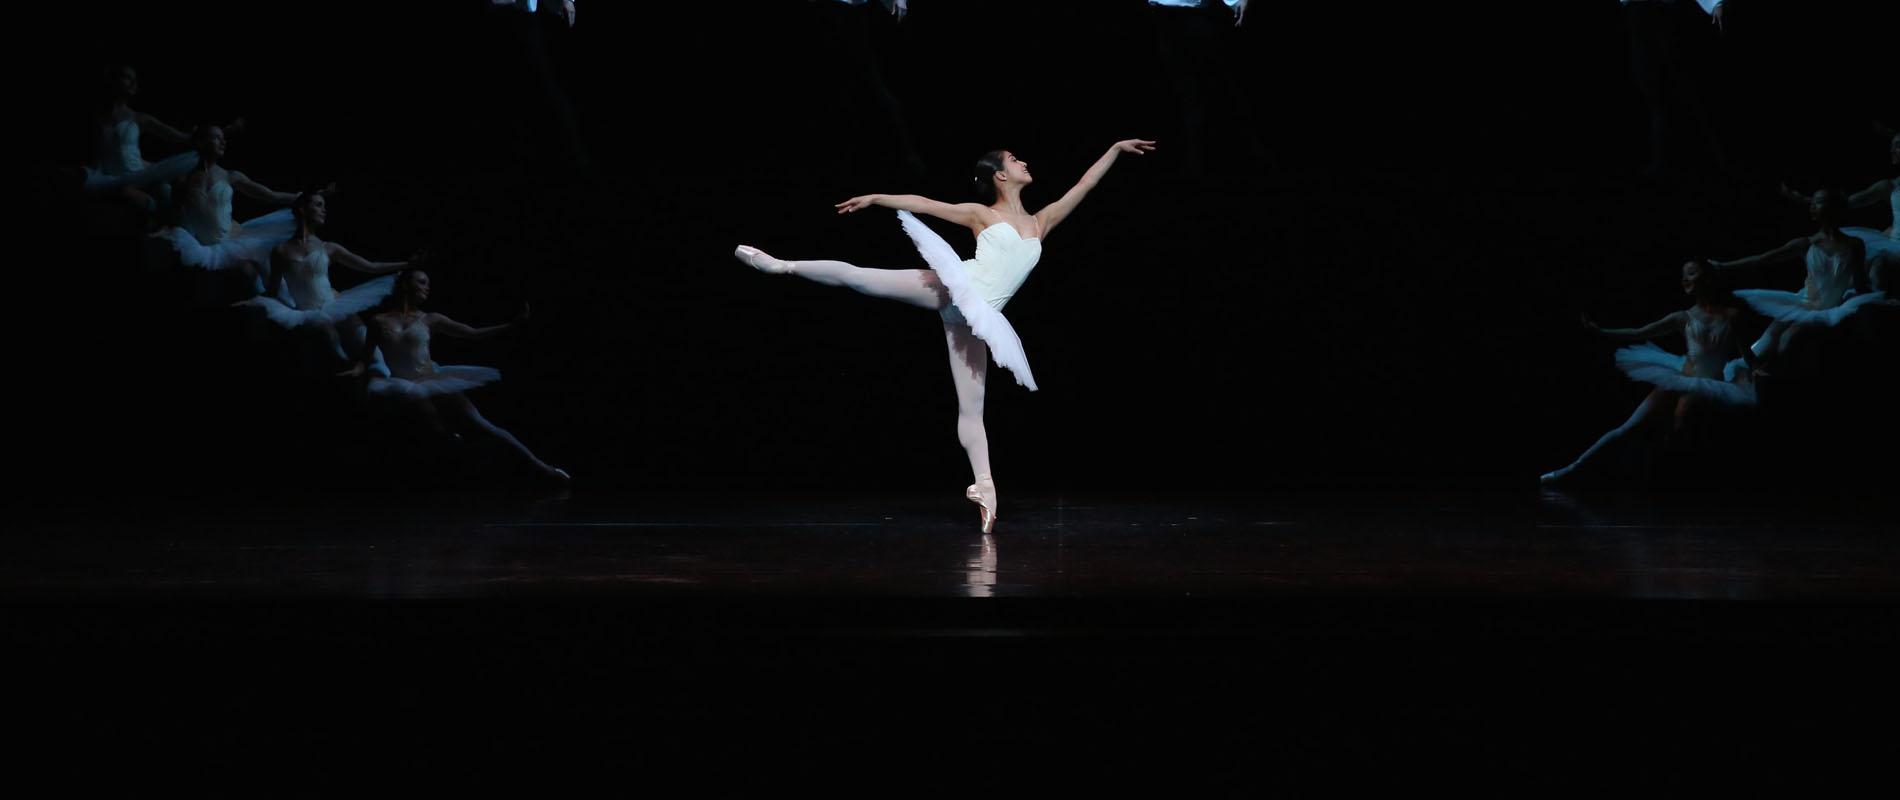 slider5-kursus-balet-pekanbaru-enpointe